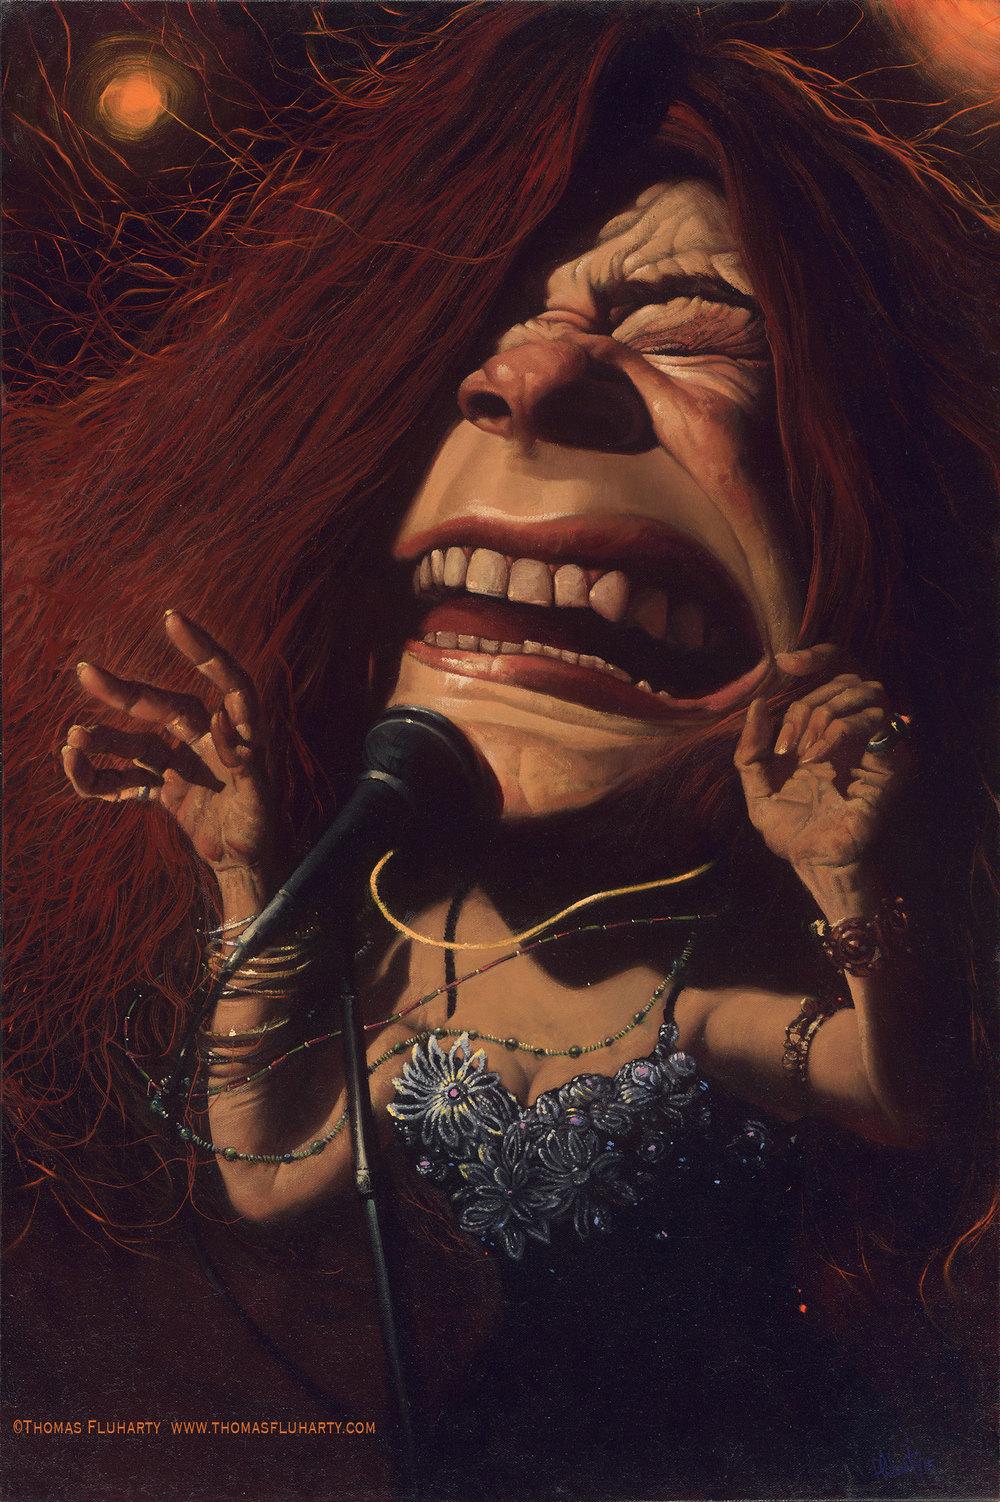 Janis Joplin por Thomas Fluharty